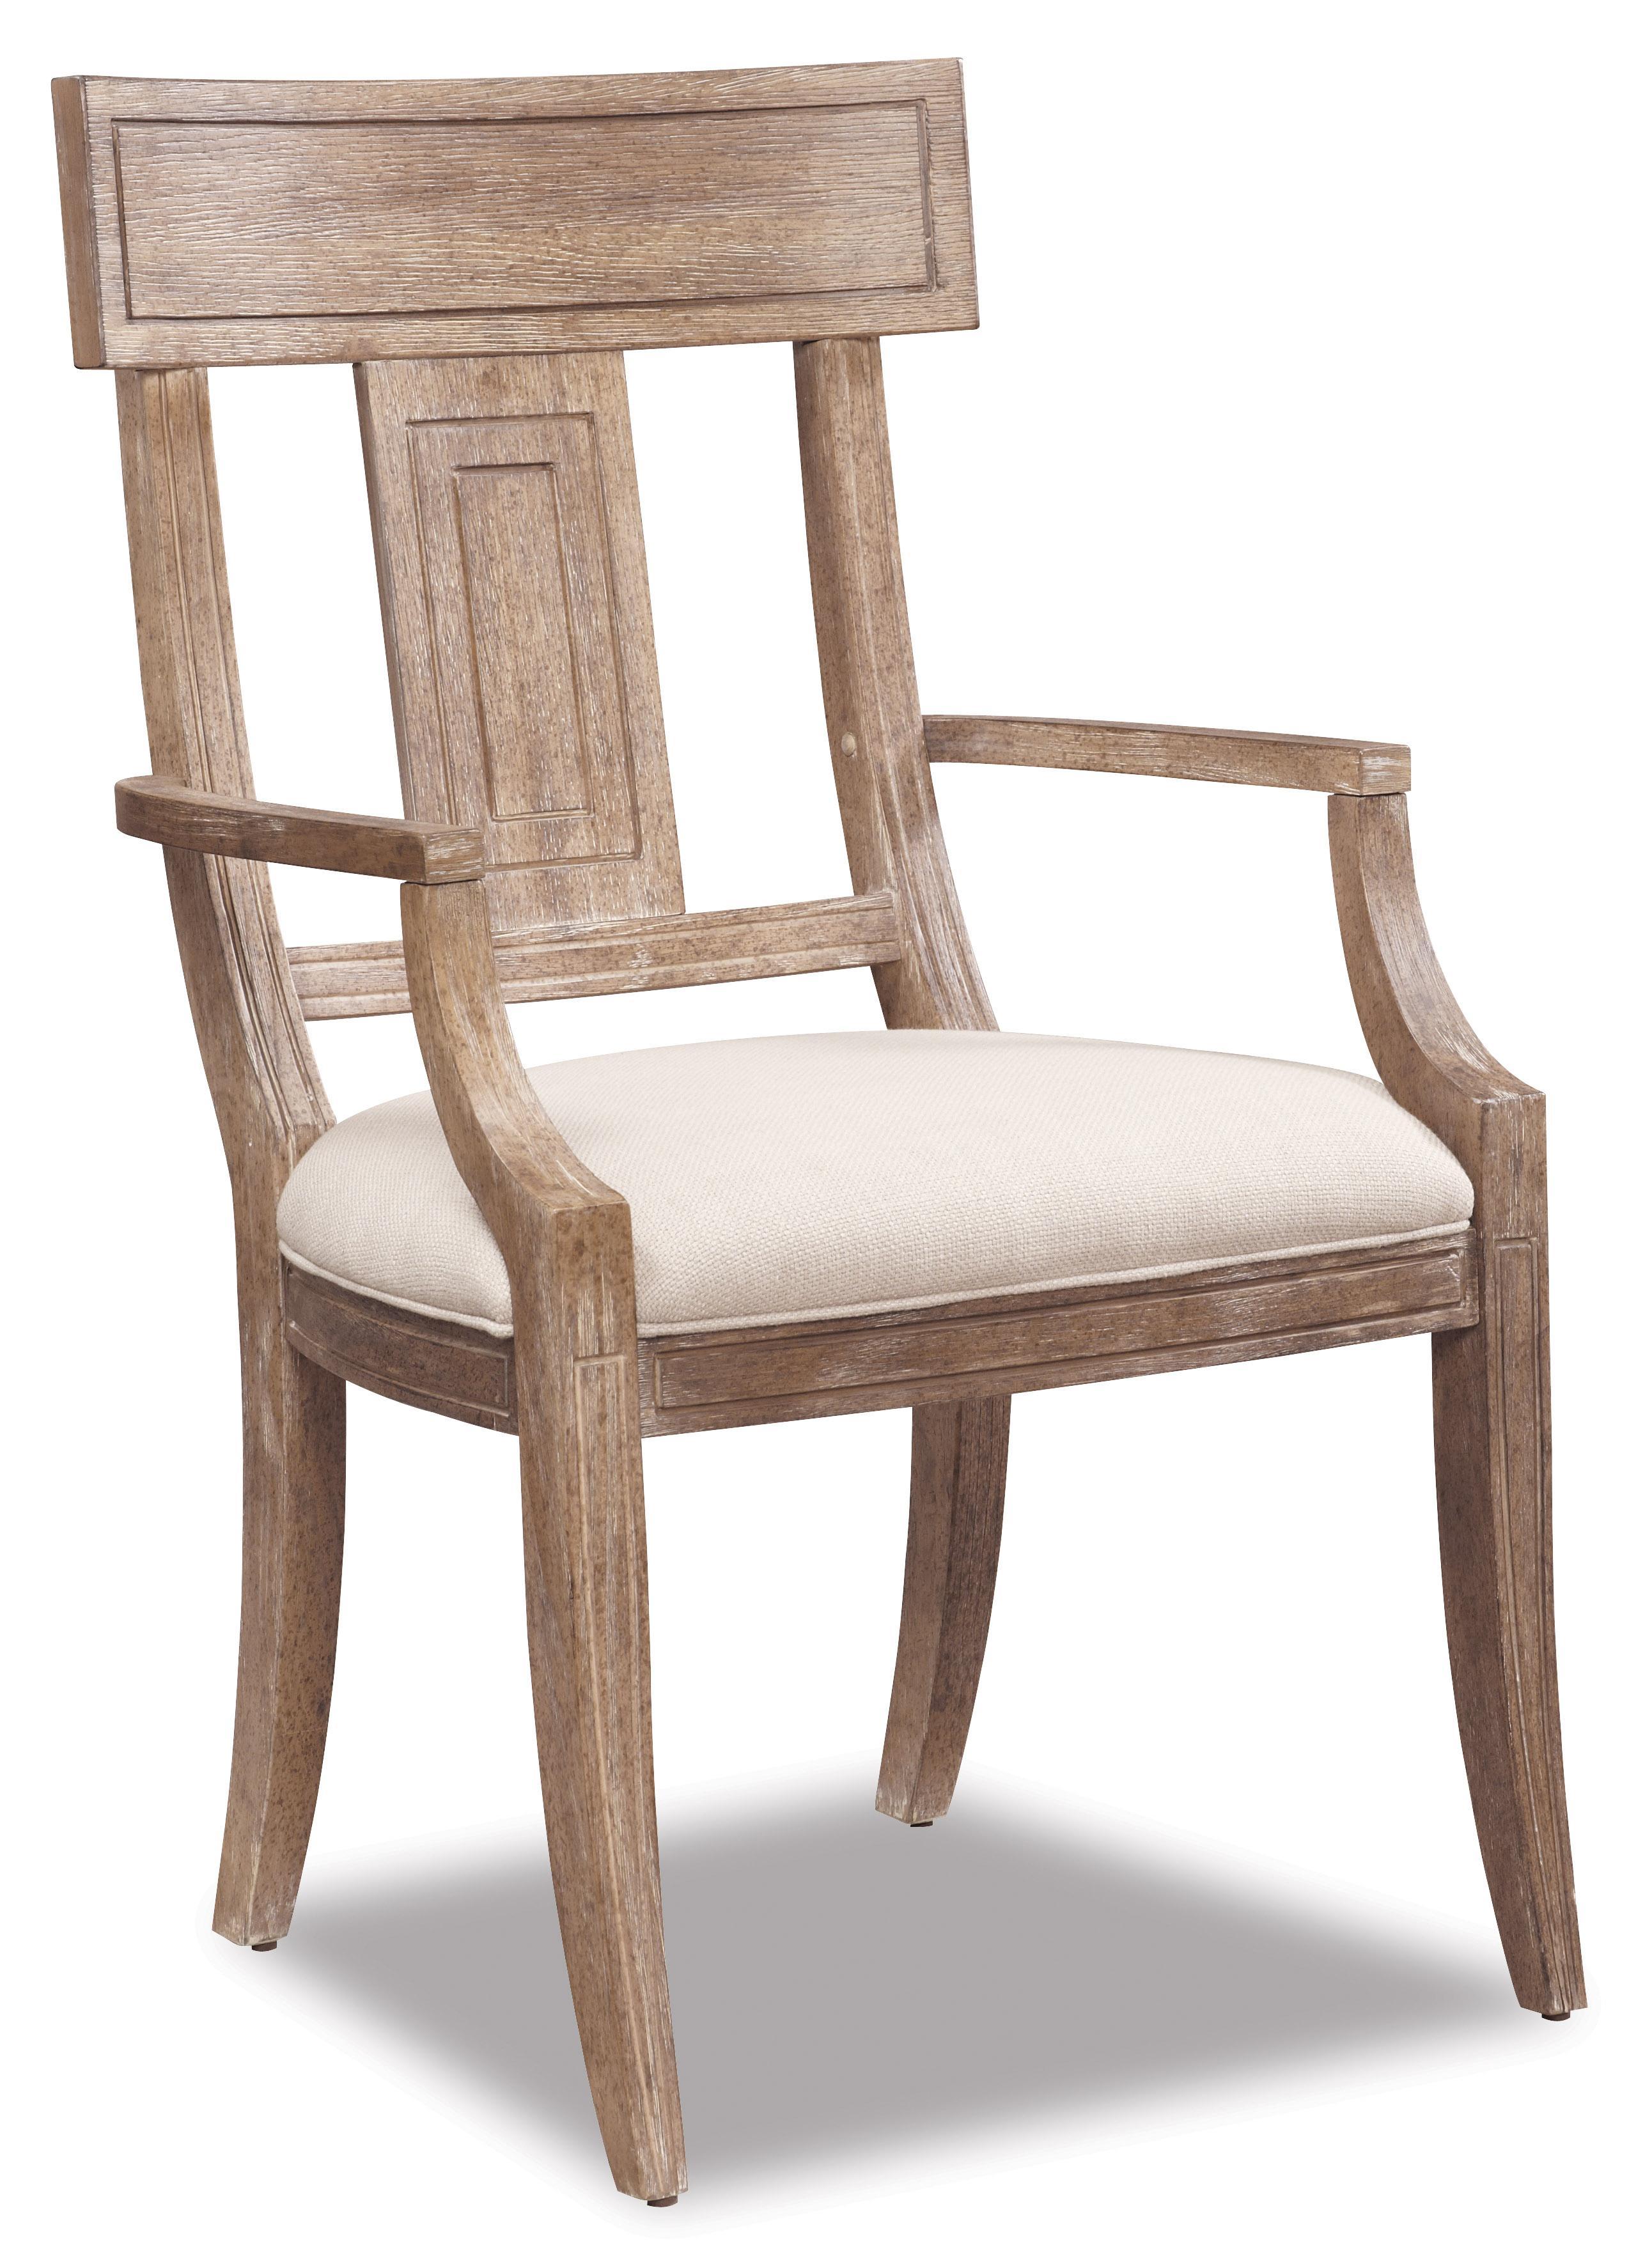 Belfort Signature Madera Splat Back Arm Chair - Item Number: 192205-2303